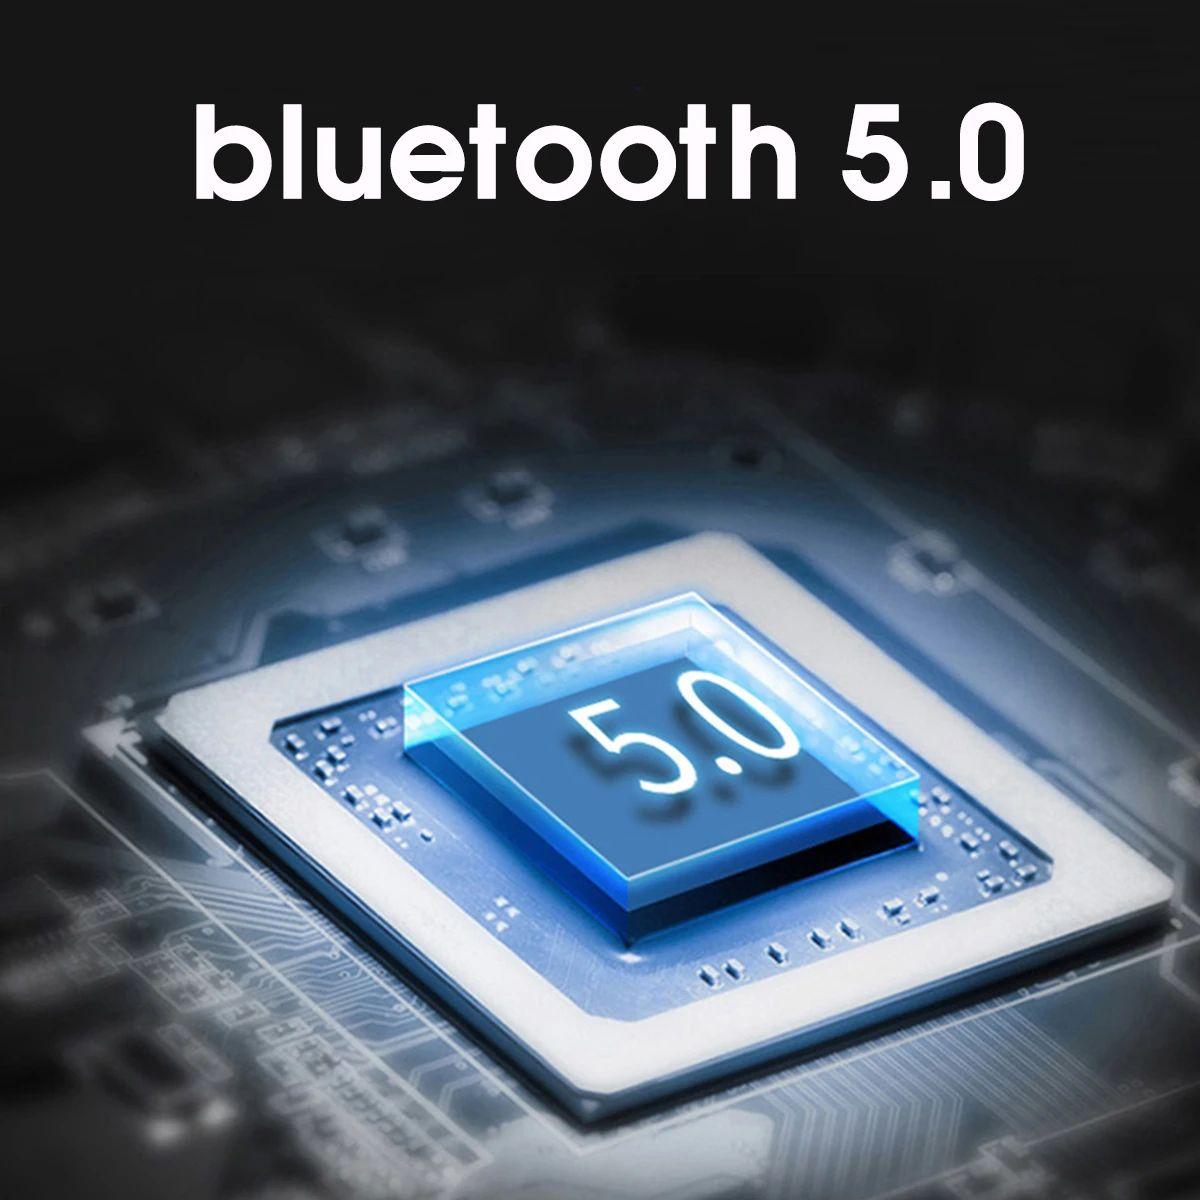 T2C TWS Bluetooth 5.0 earphone hifi stereo type-c charging case wholesale china 1 (11)